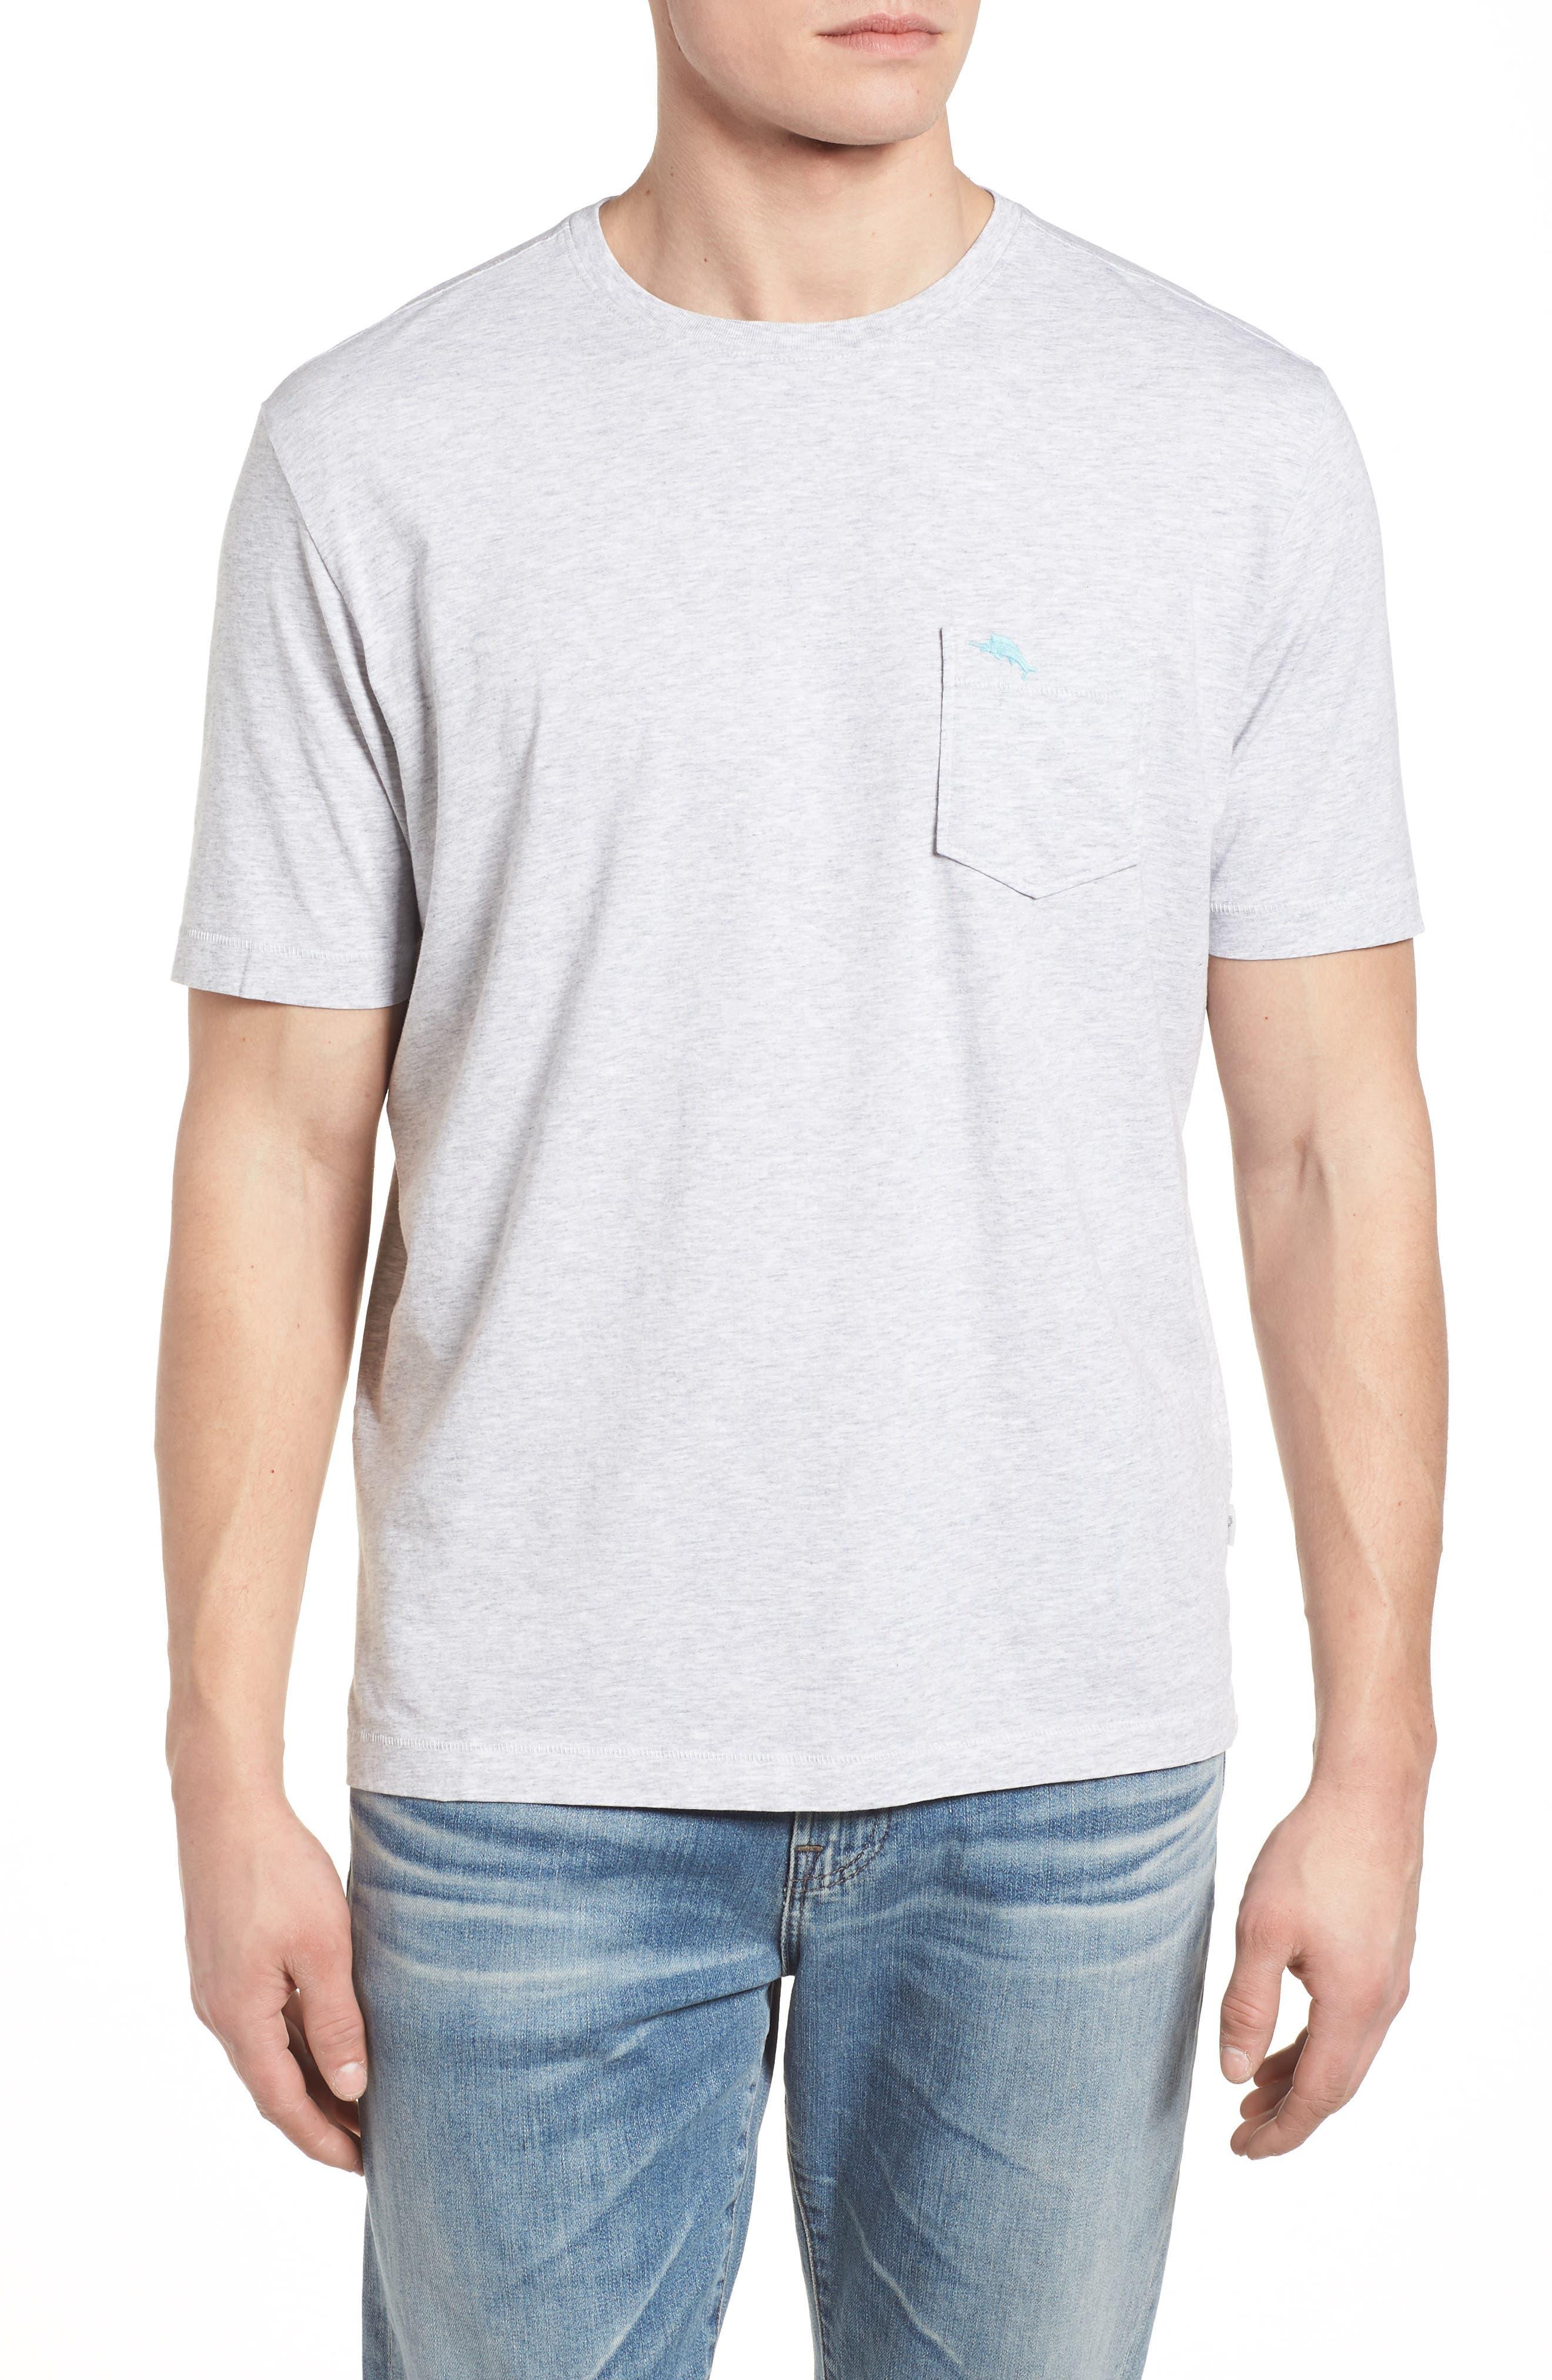 New Bali Skyline T-Shirt,                         Main,                         color, Zinc Gray Heather